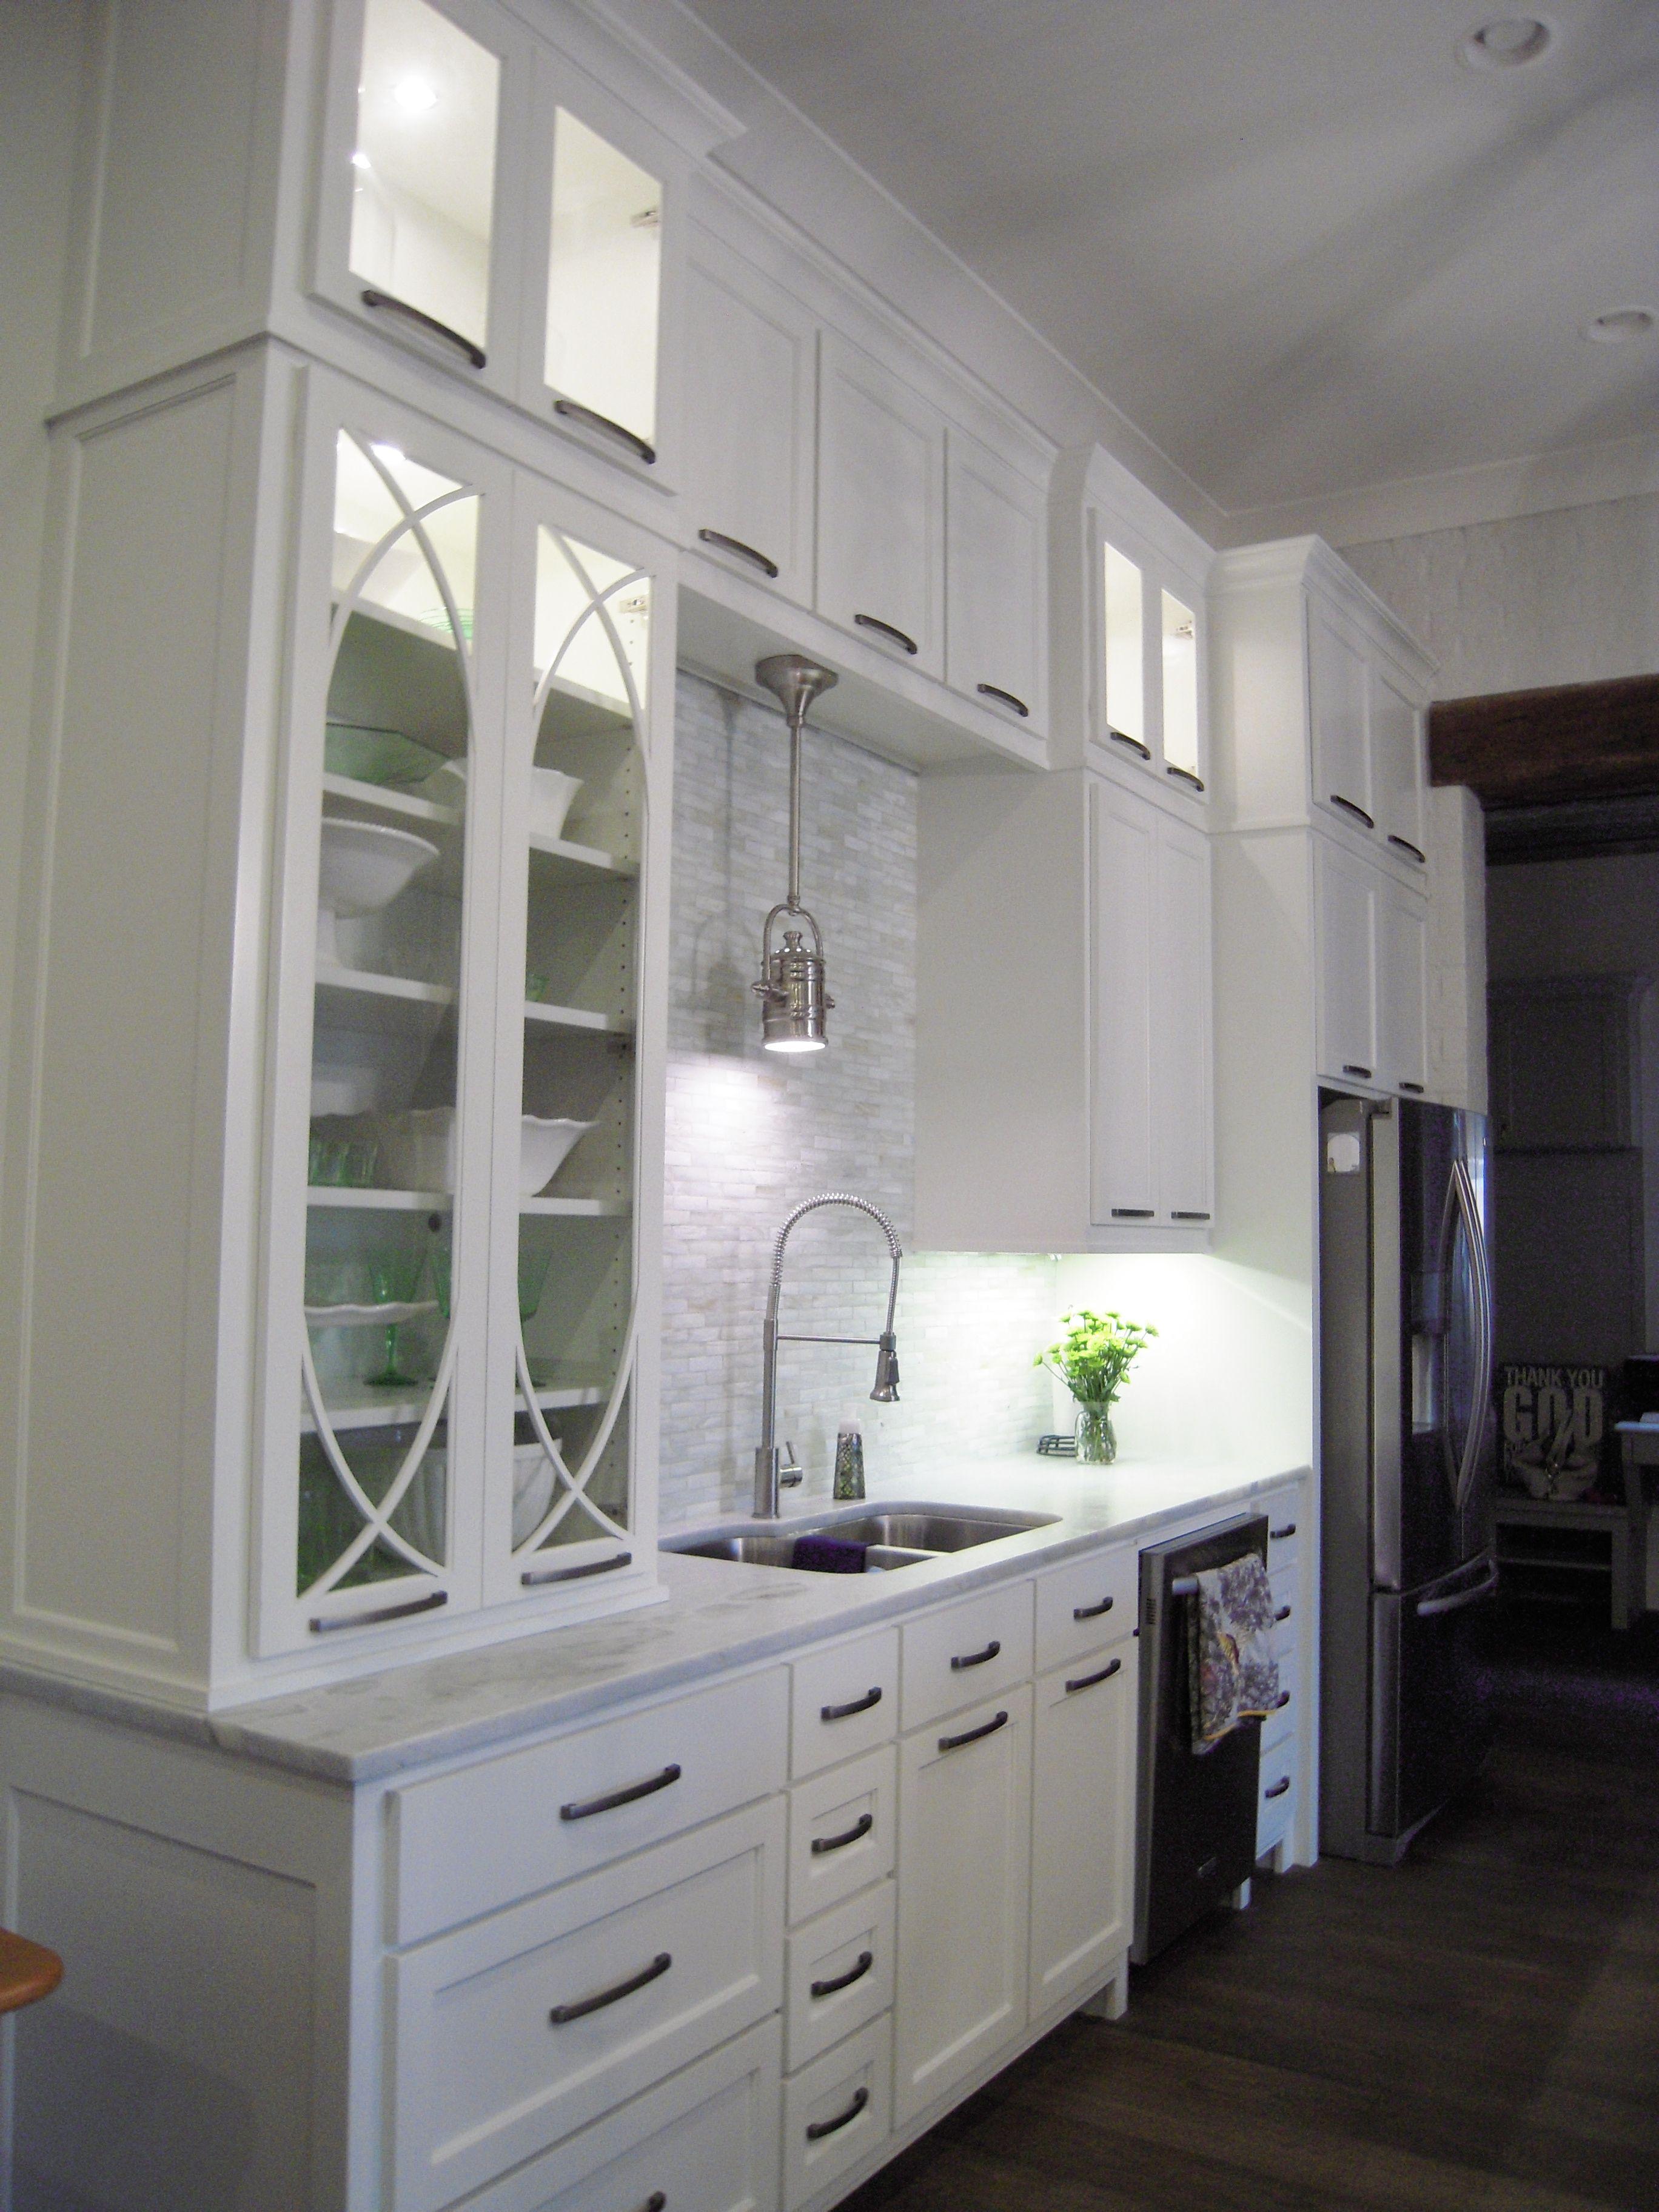 Custom kitchen by wooden specialties our portfolio pinterest